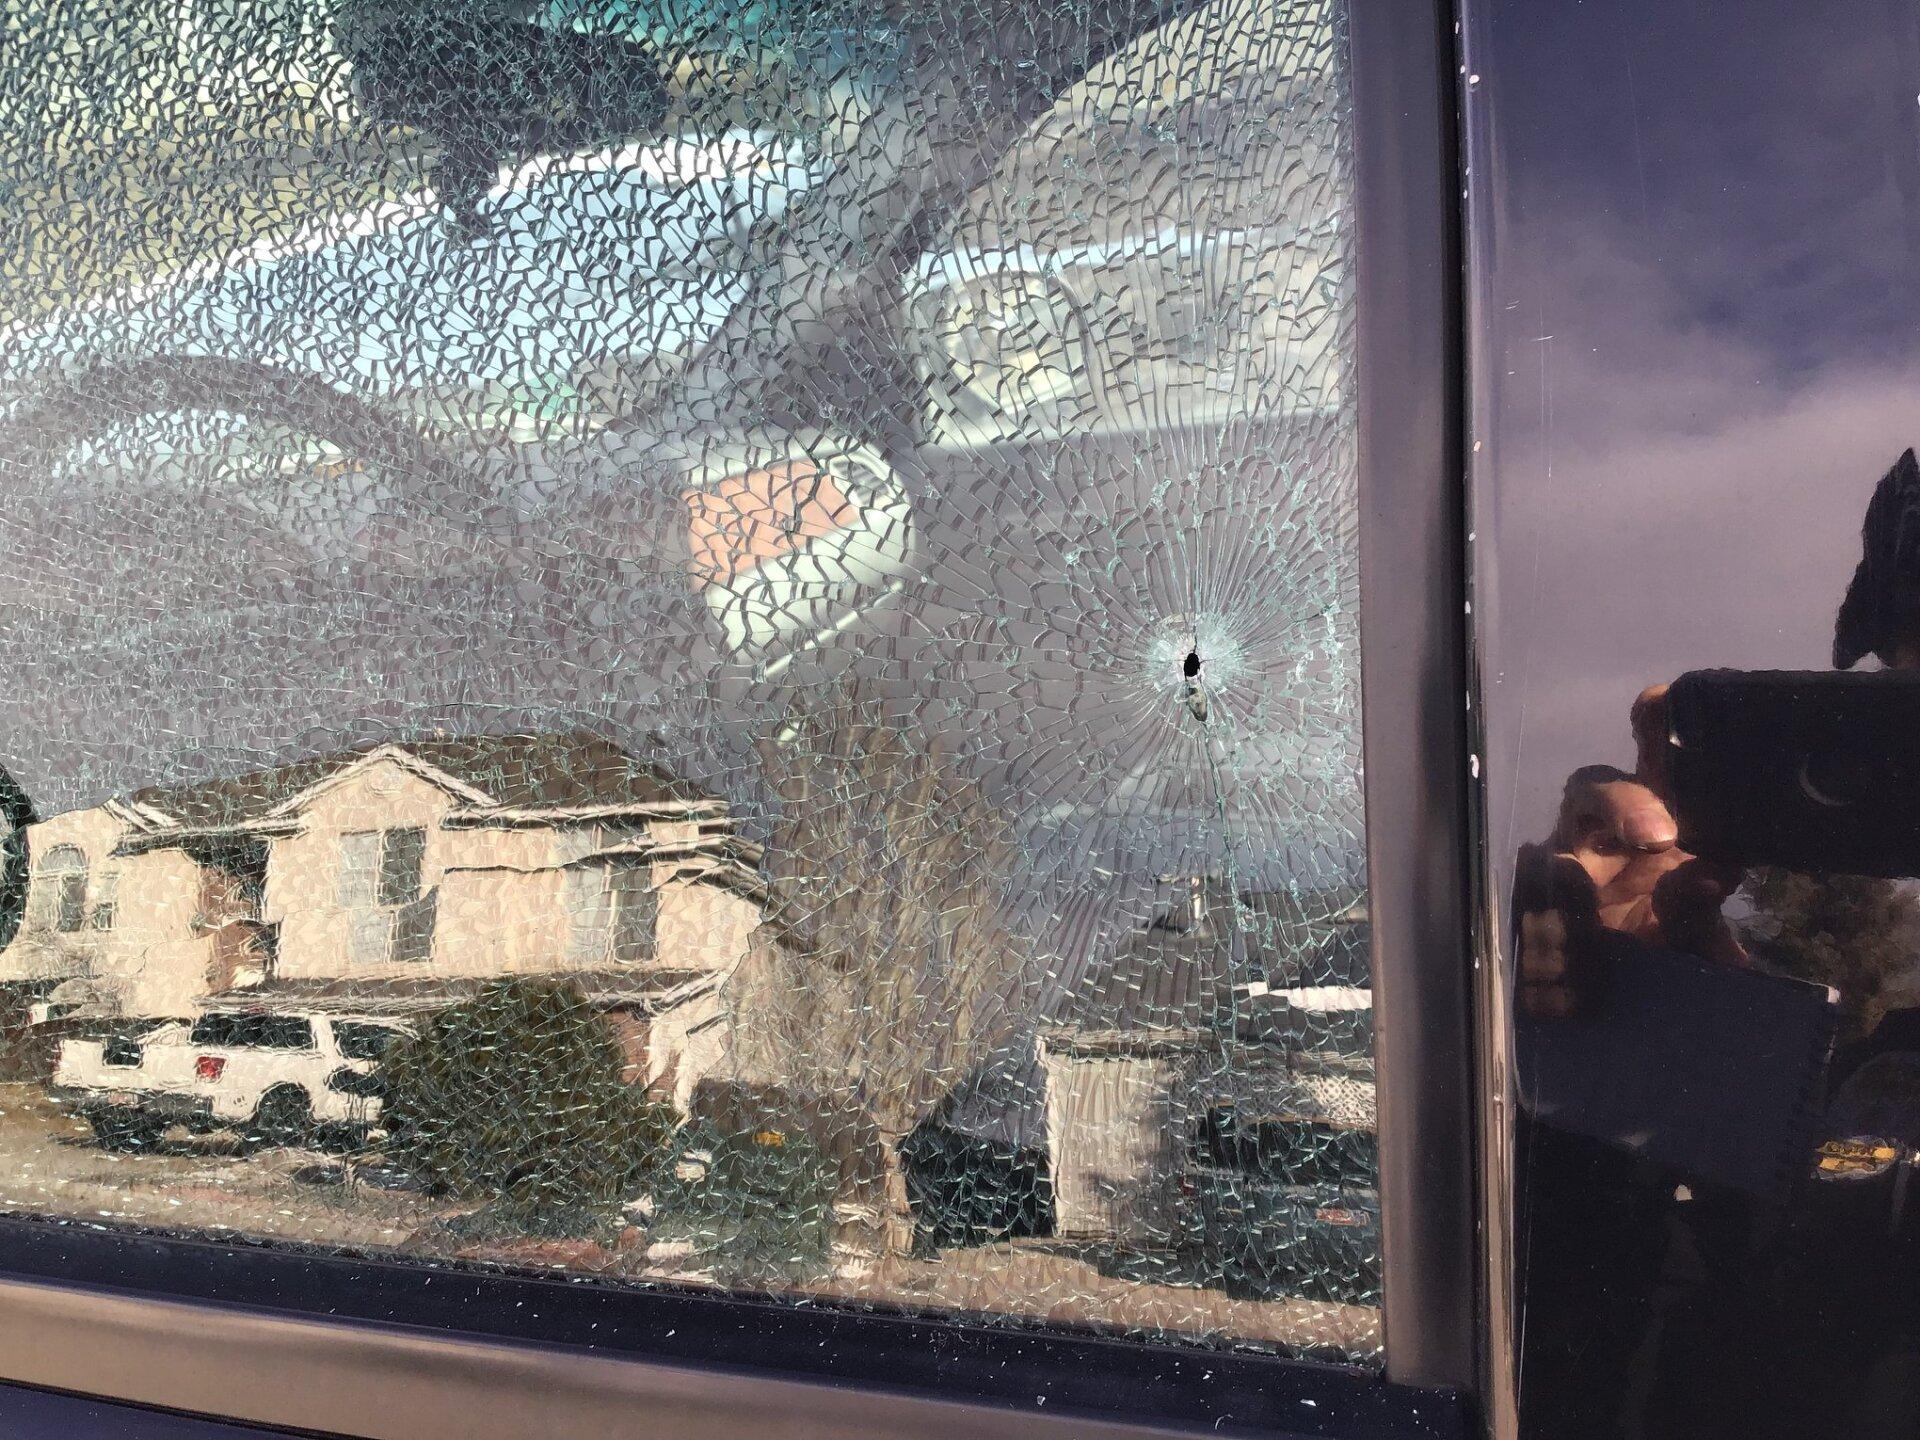 Photos: Several car and house windows shot by BB gun inLayton